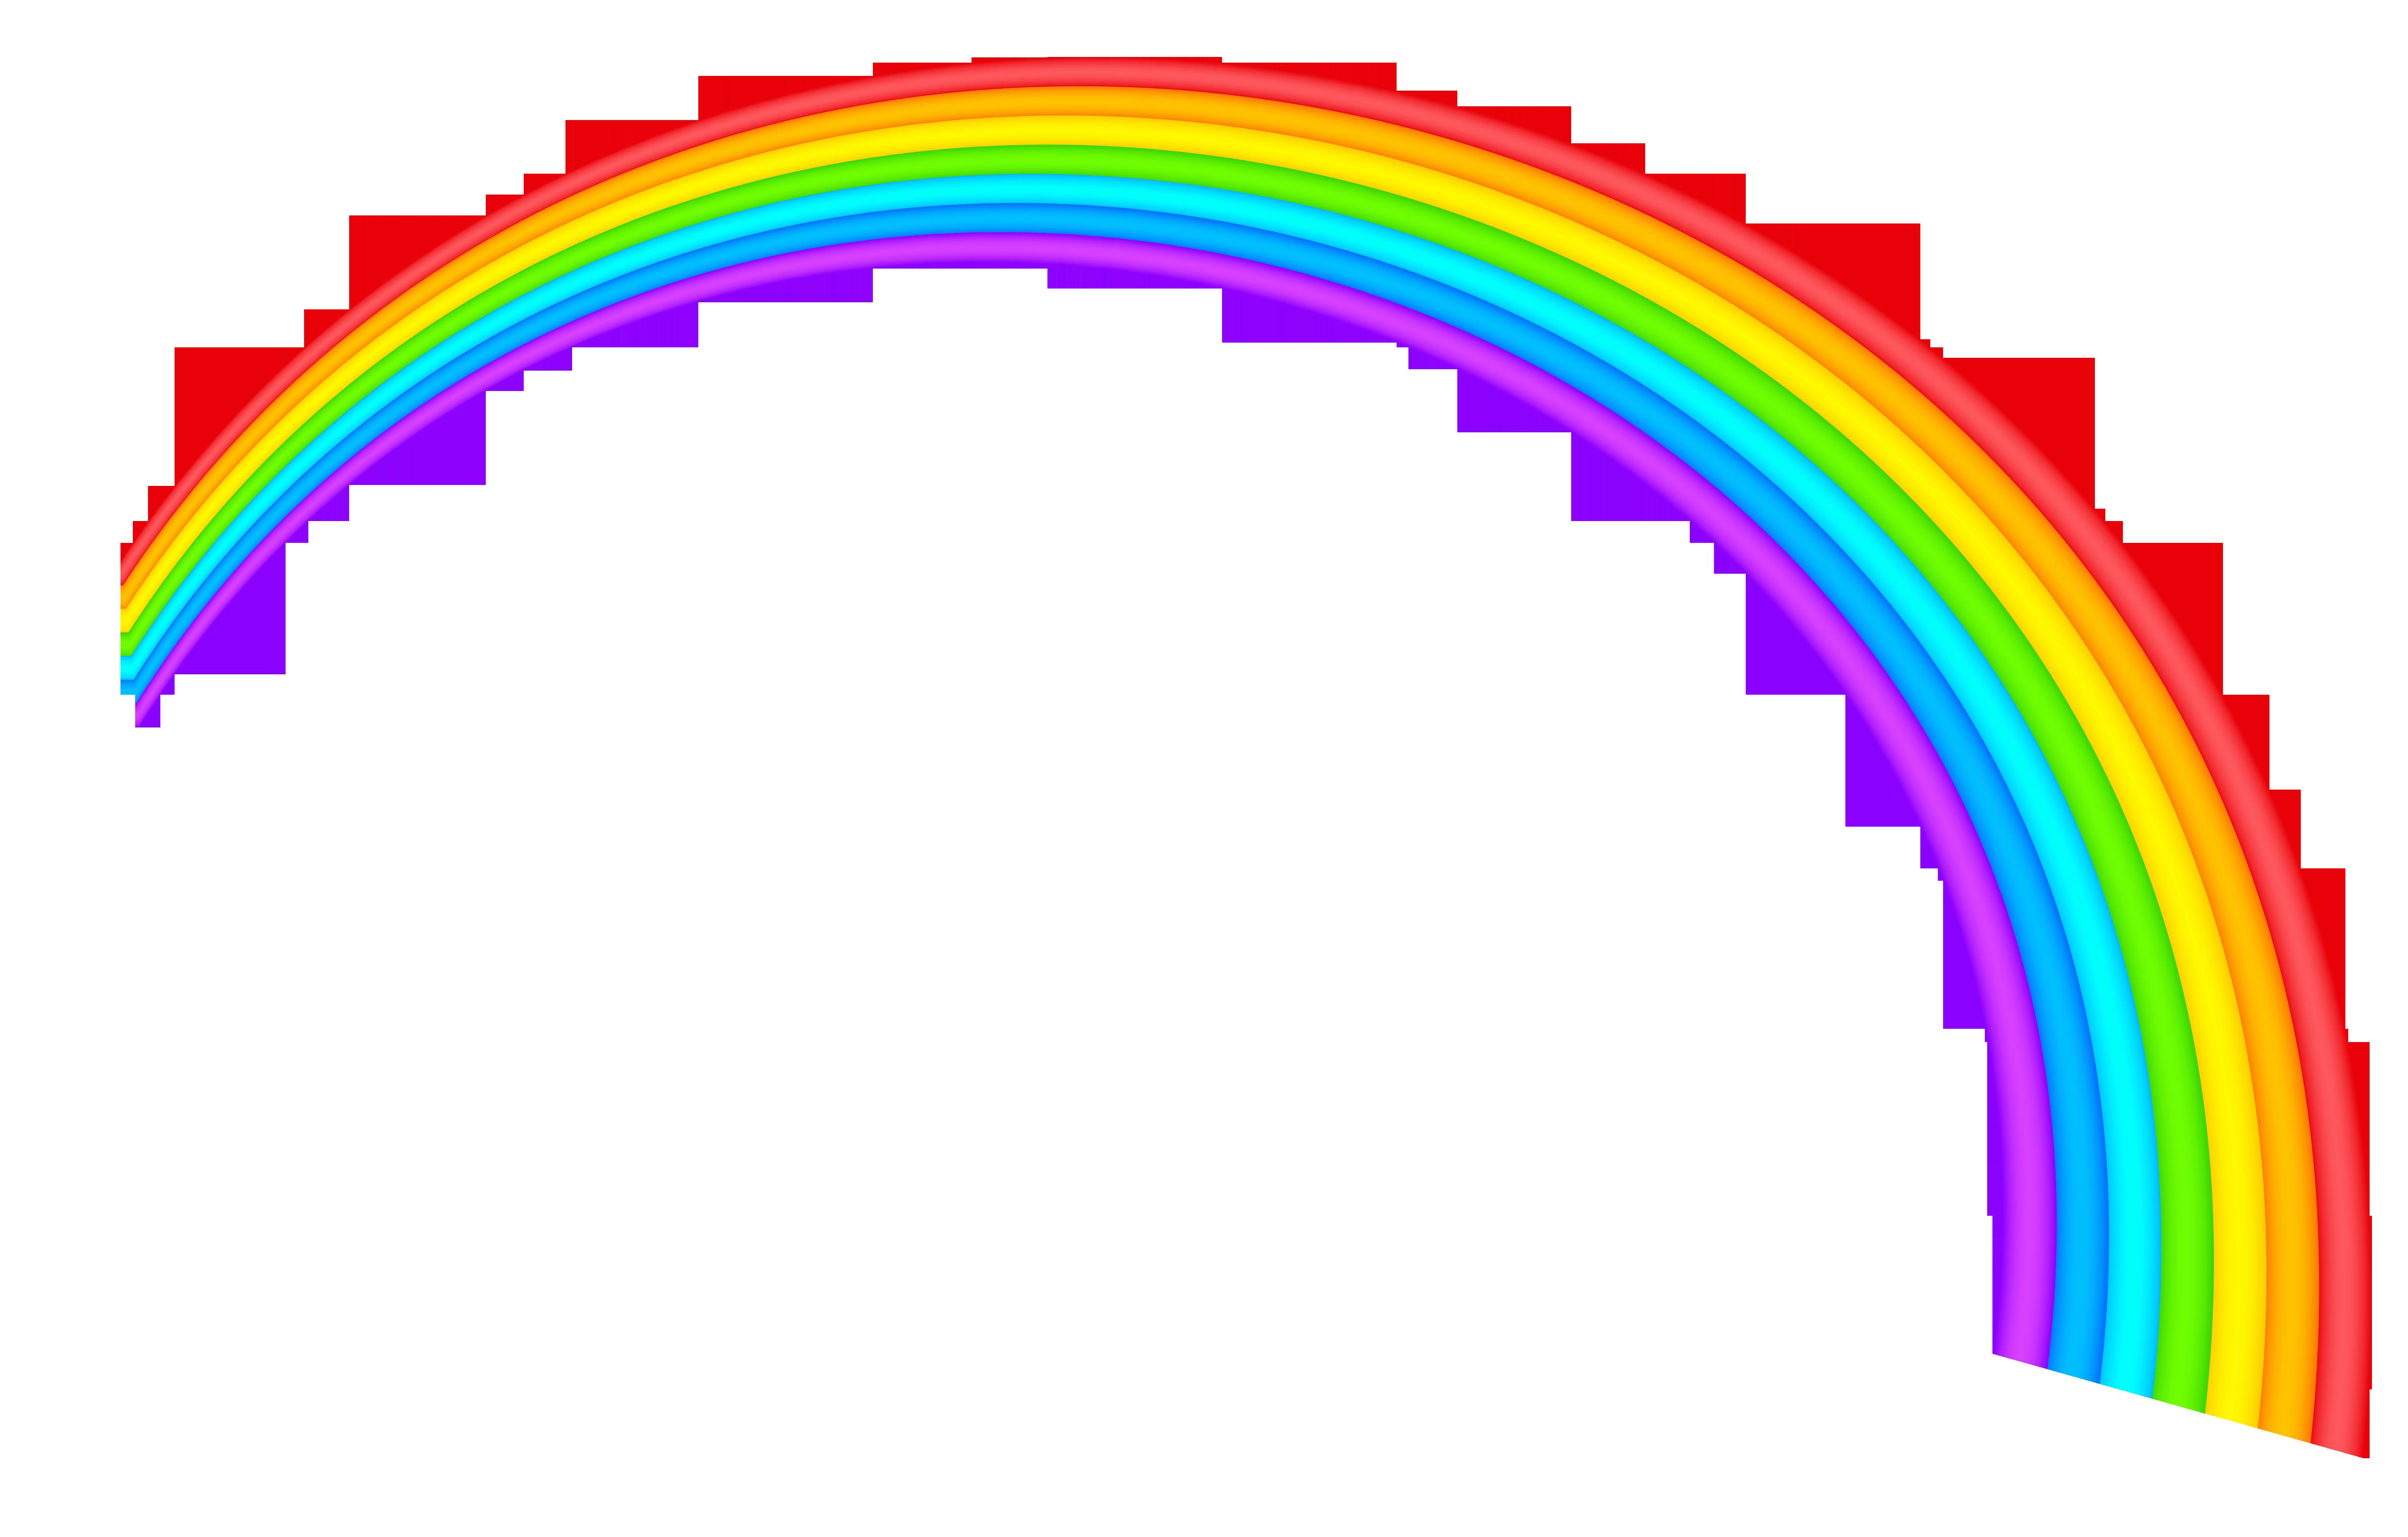 Free rainbow clipart public domain rainbow clip art images.